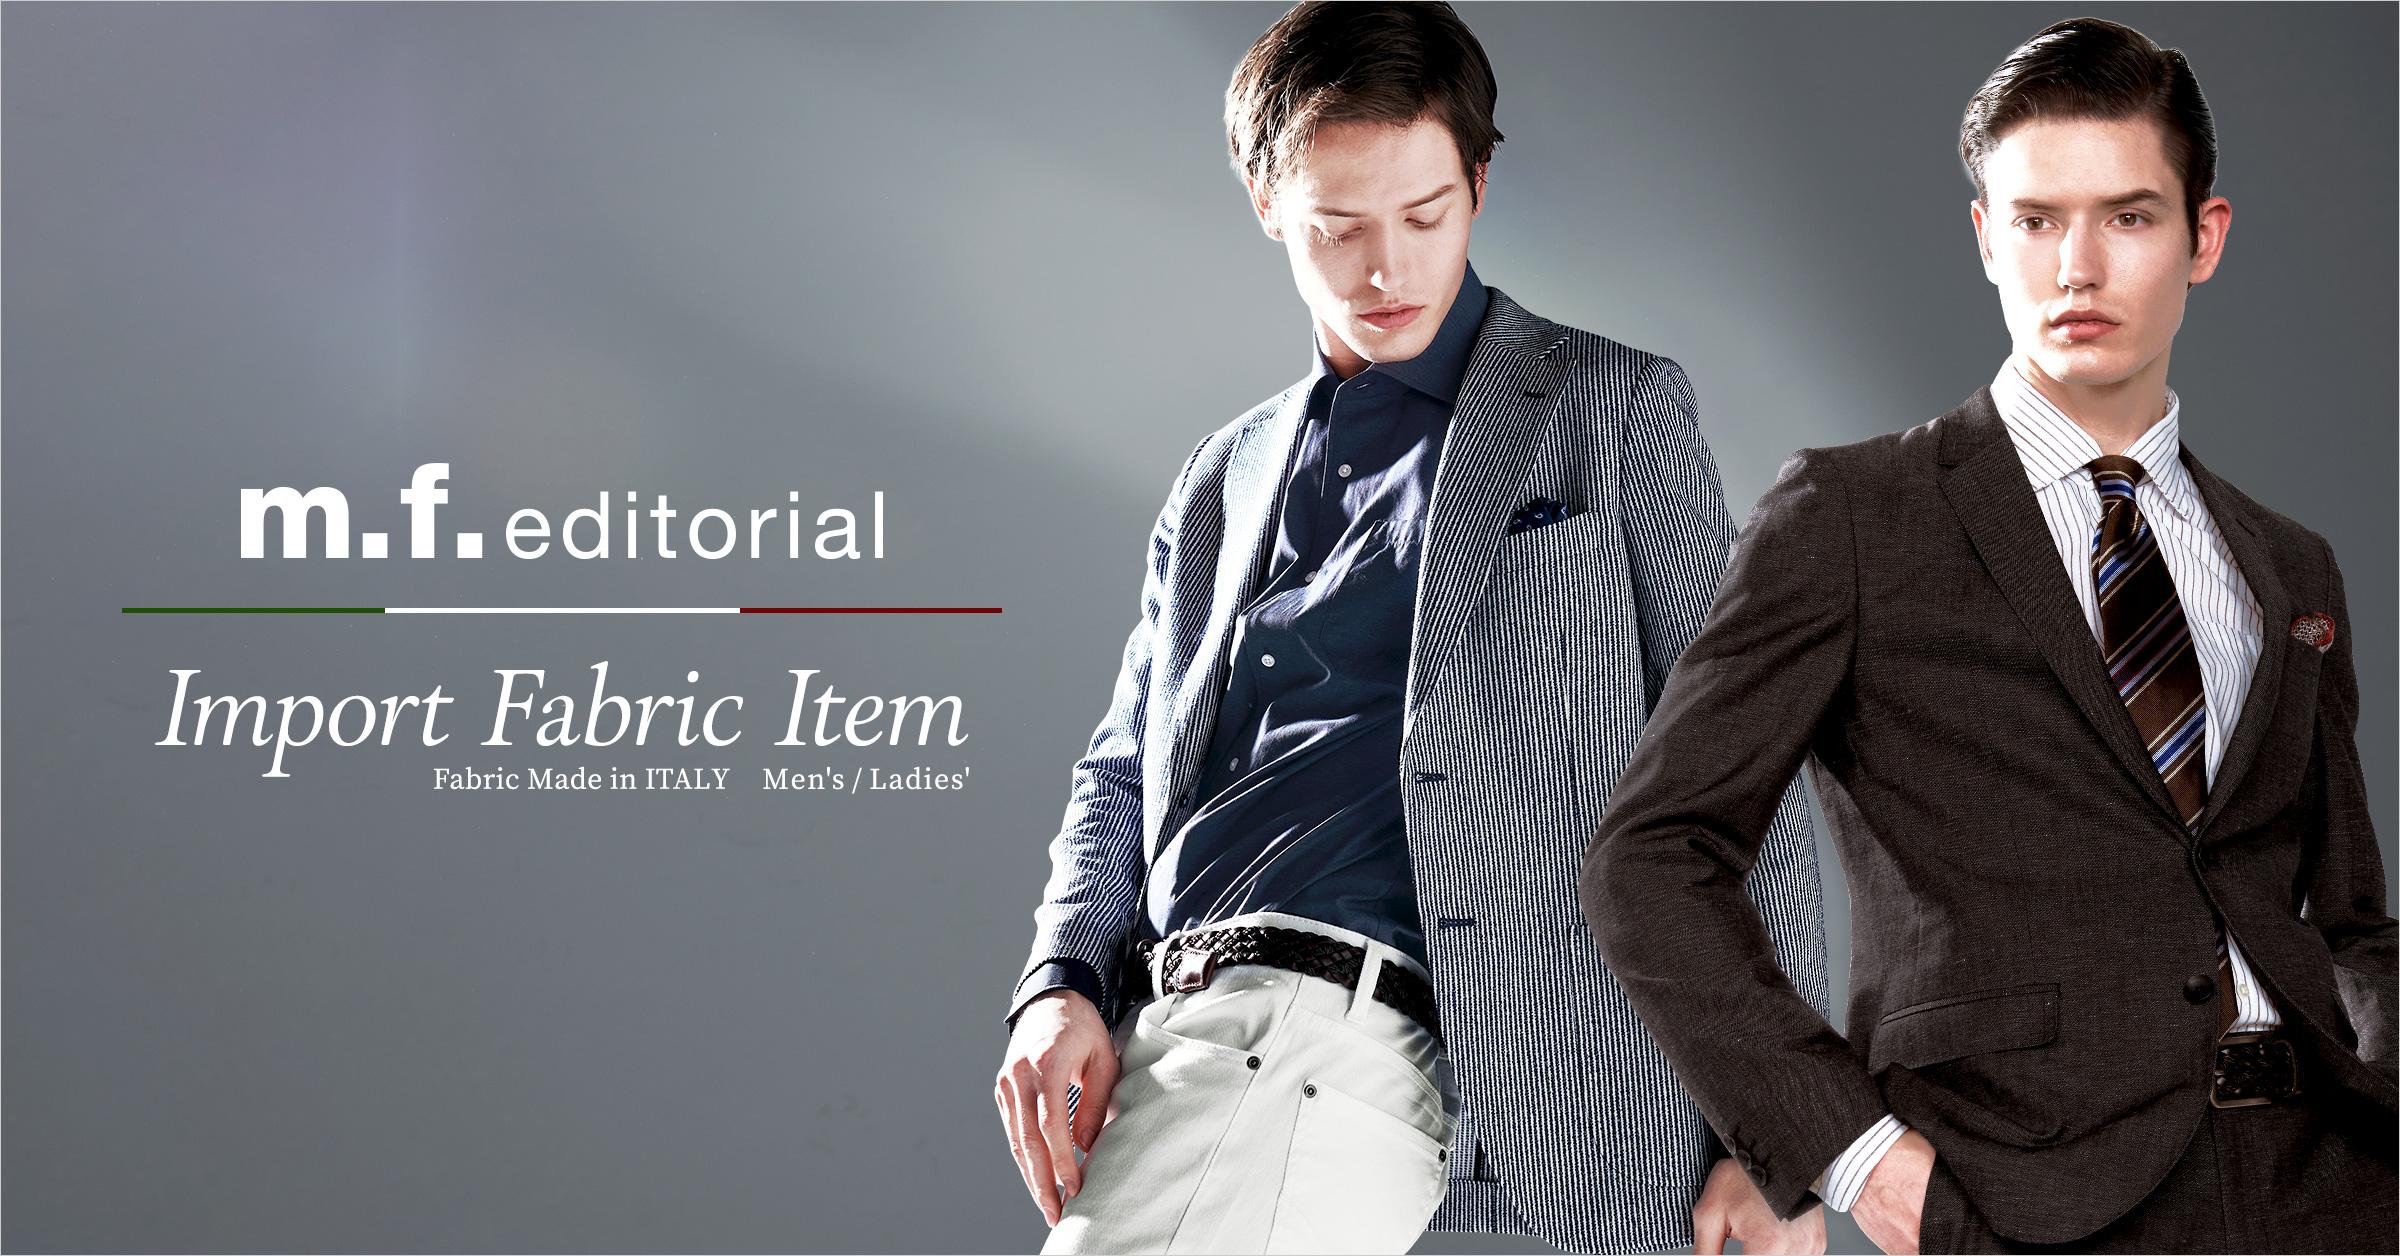 Import Fabric Item             </a>